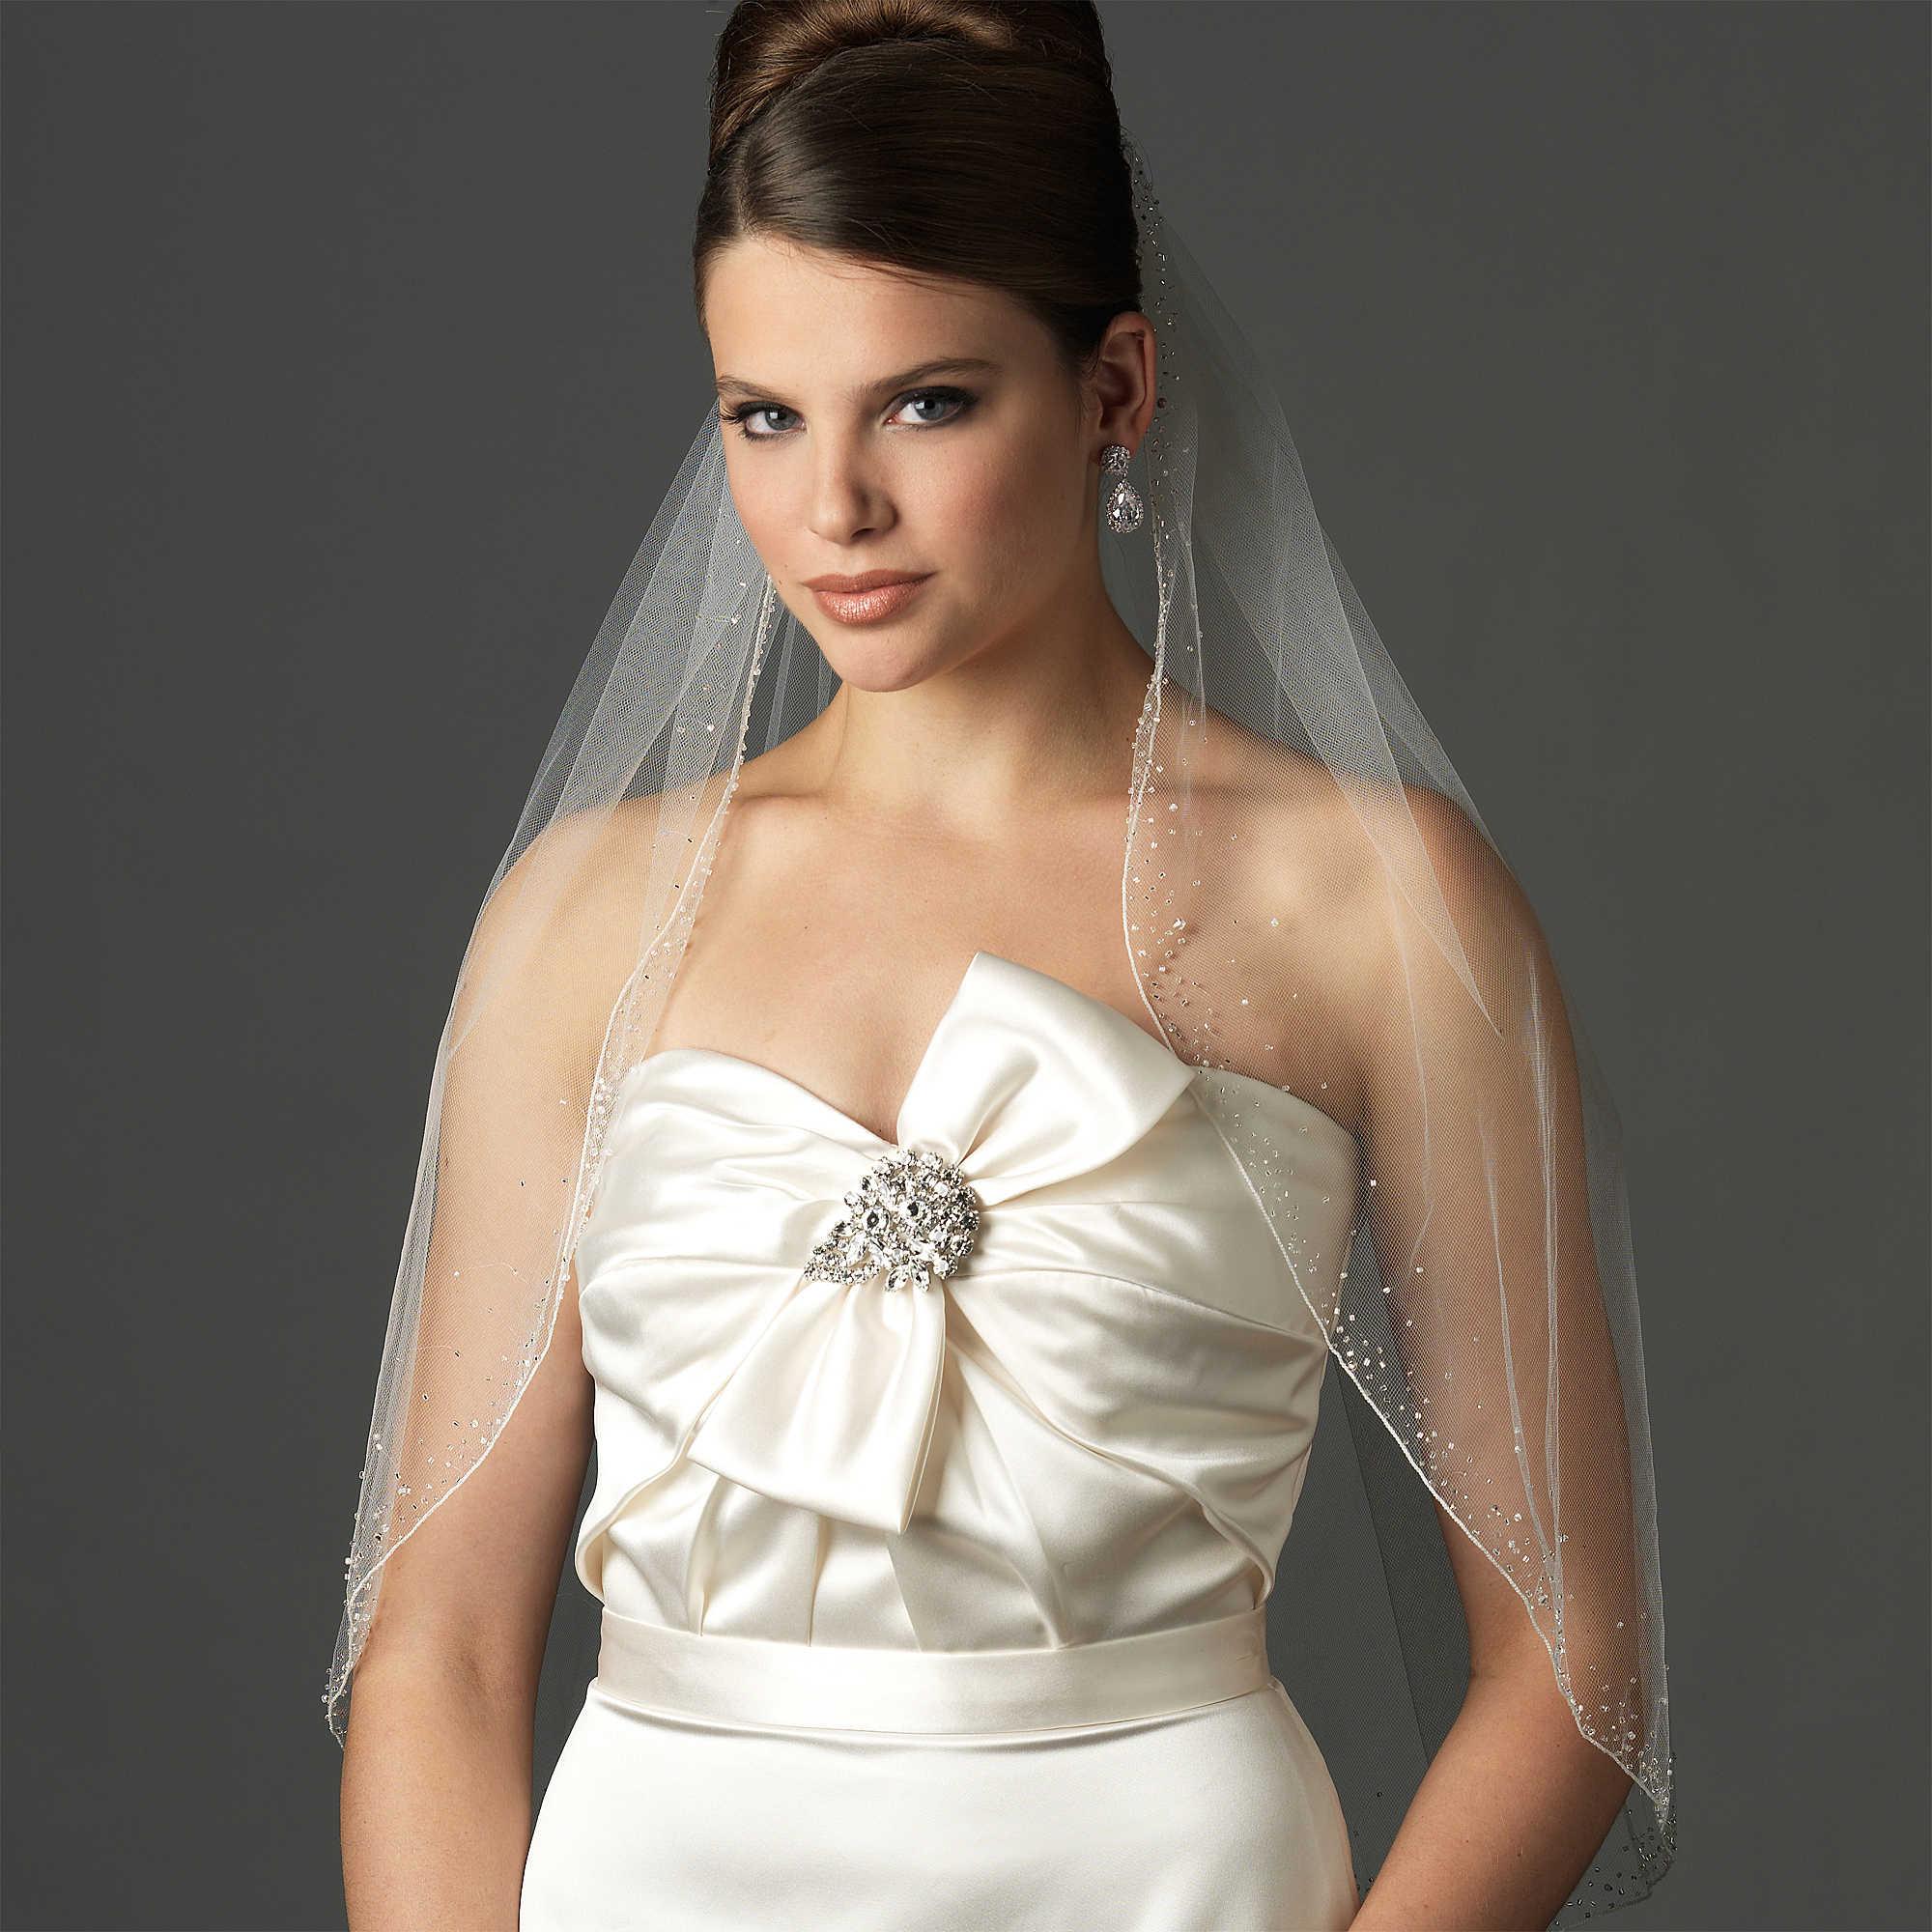 Types of Wedding Veils - Elbow Veils